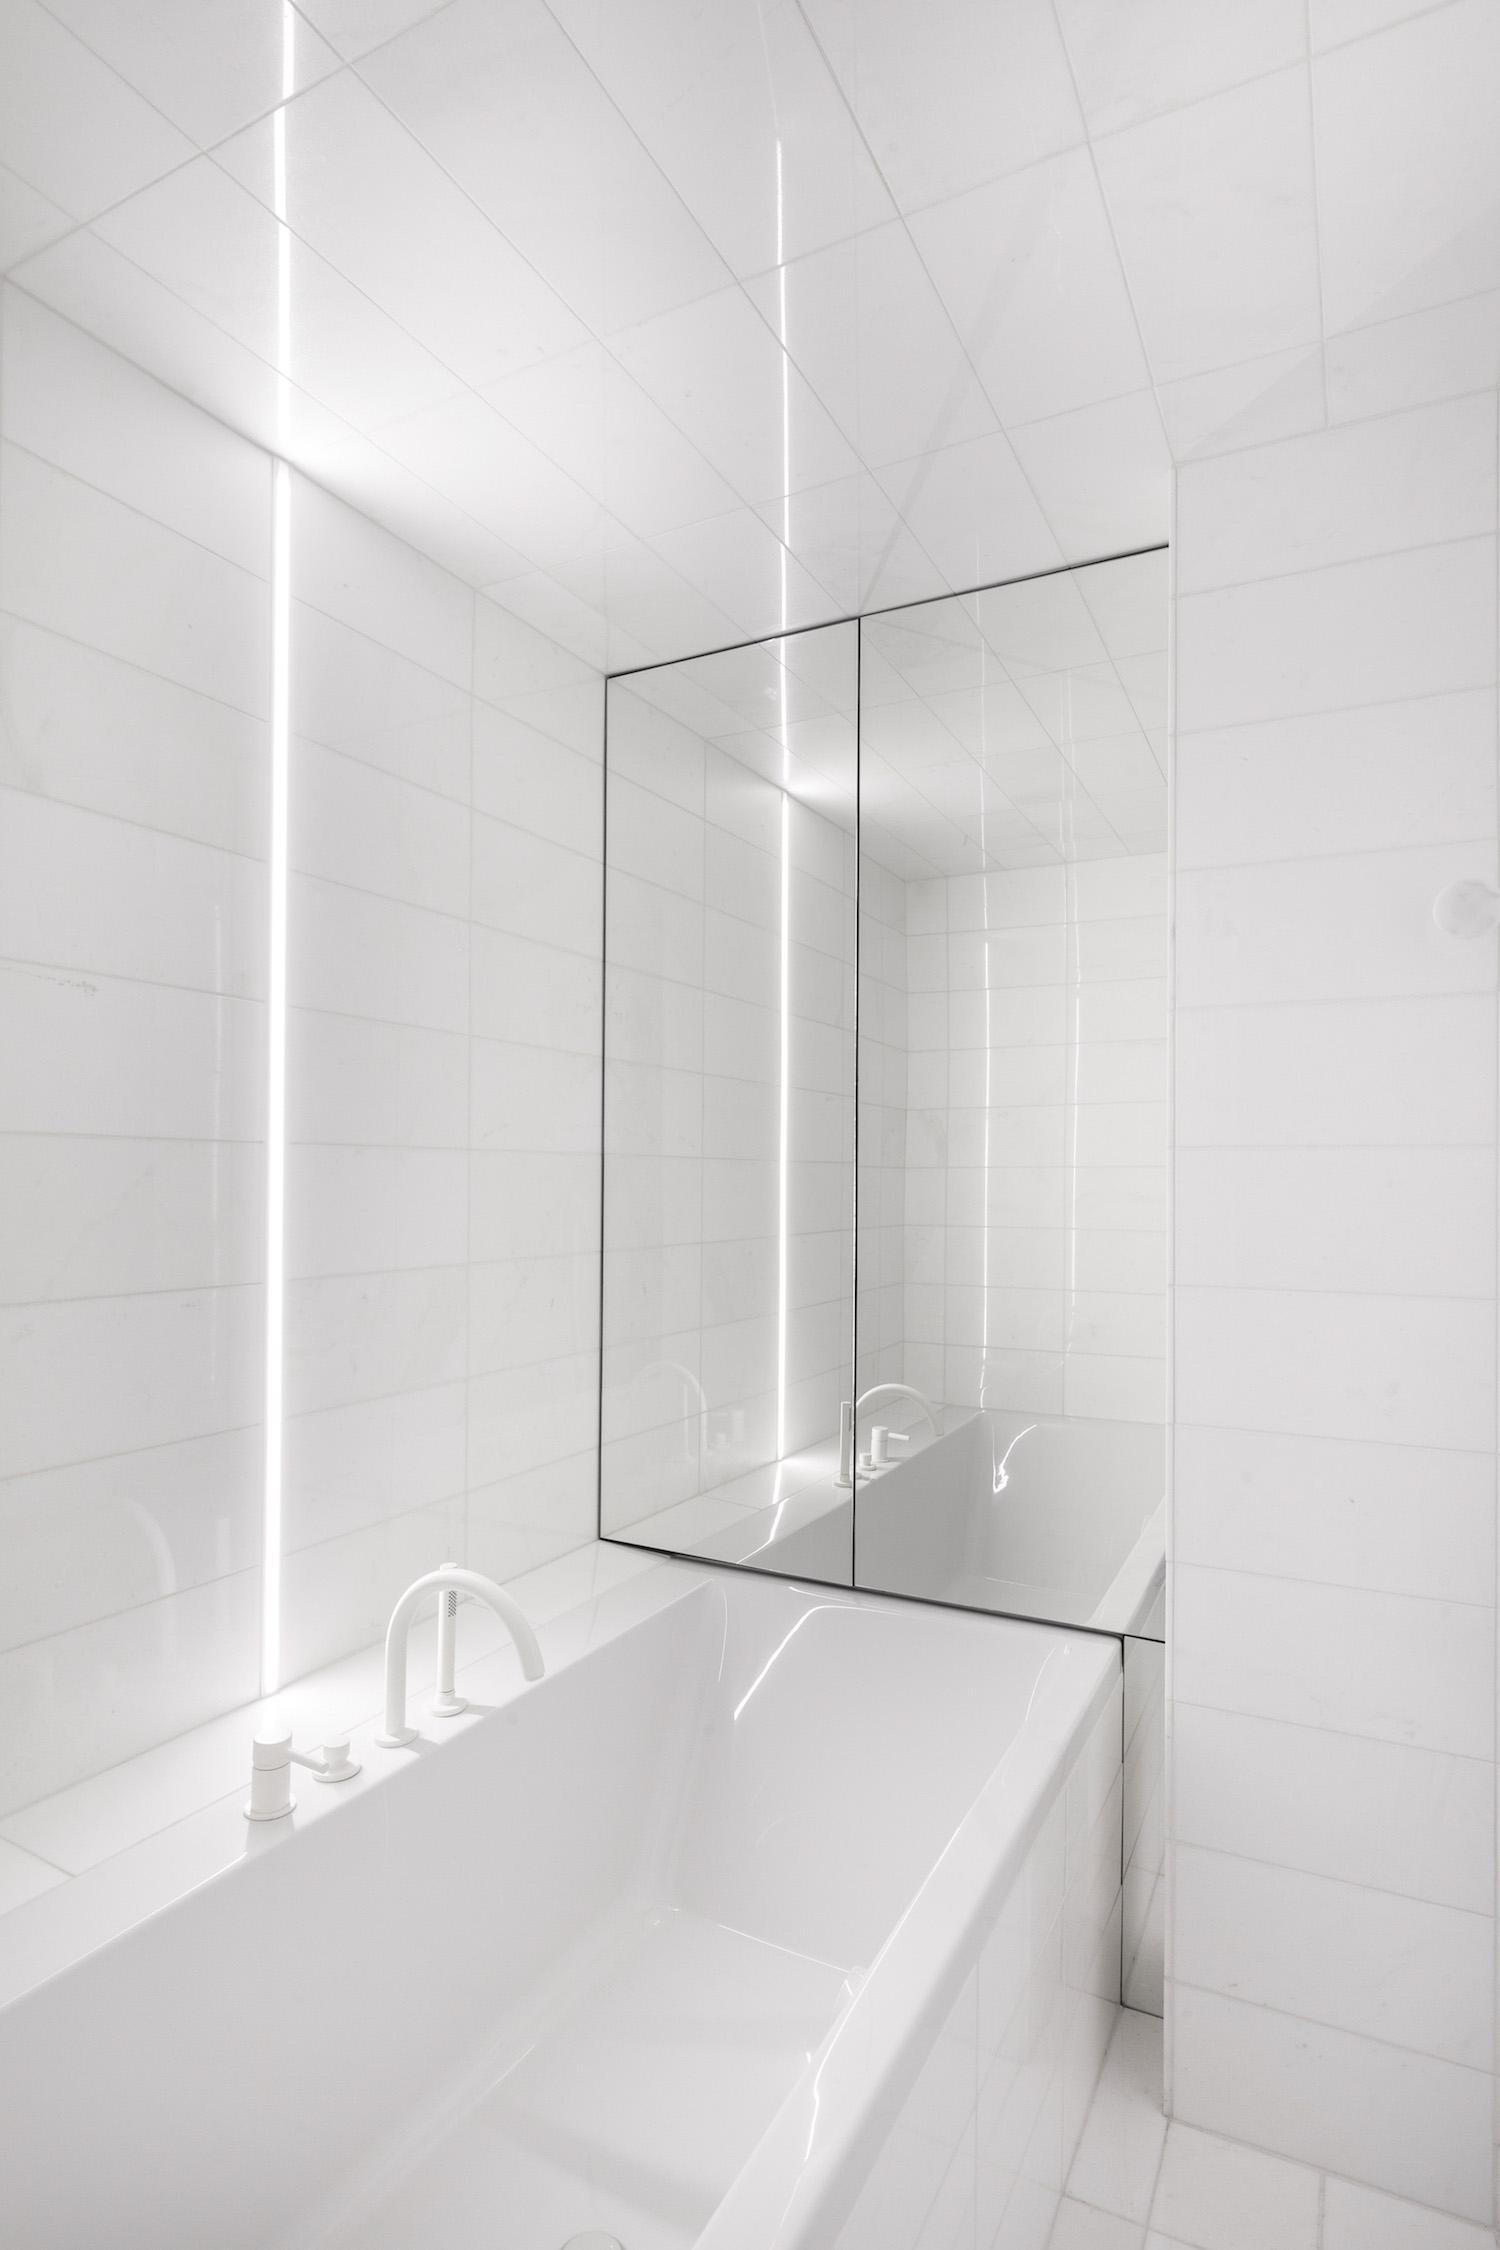 iGNANT_Architecture_JeanVervilleArchitecte_IN3_MaximeBrouillet_05